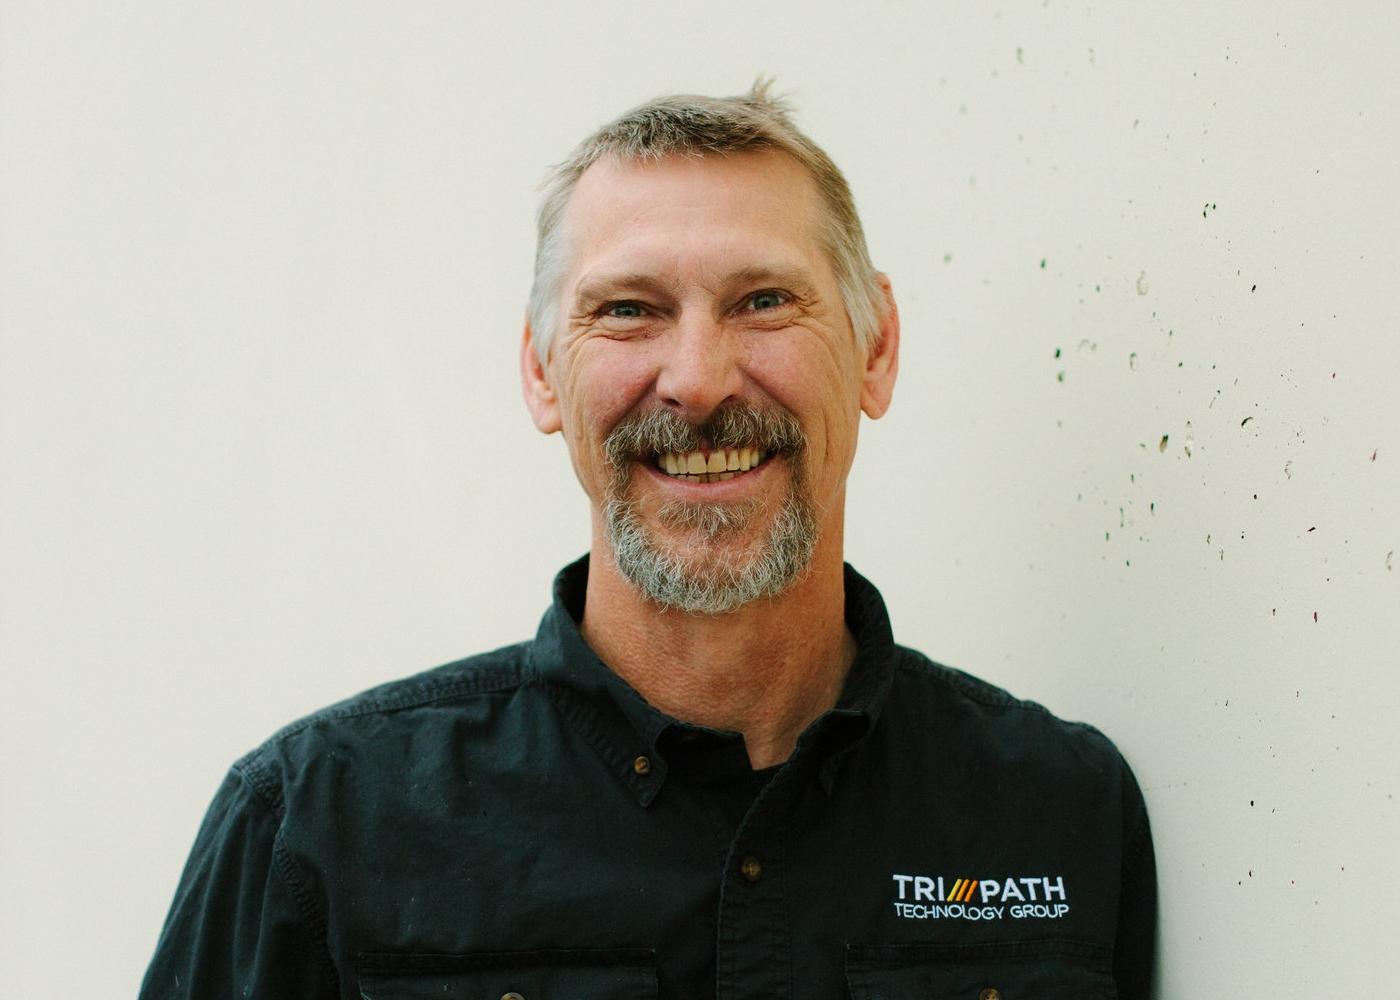 Tony Malmlof, Installer /// Safety Manager